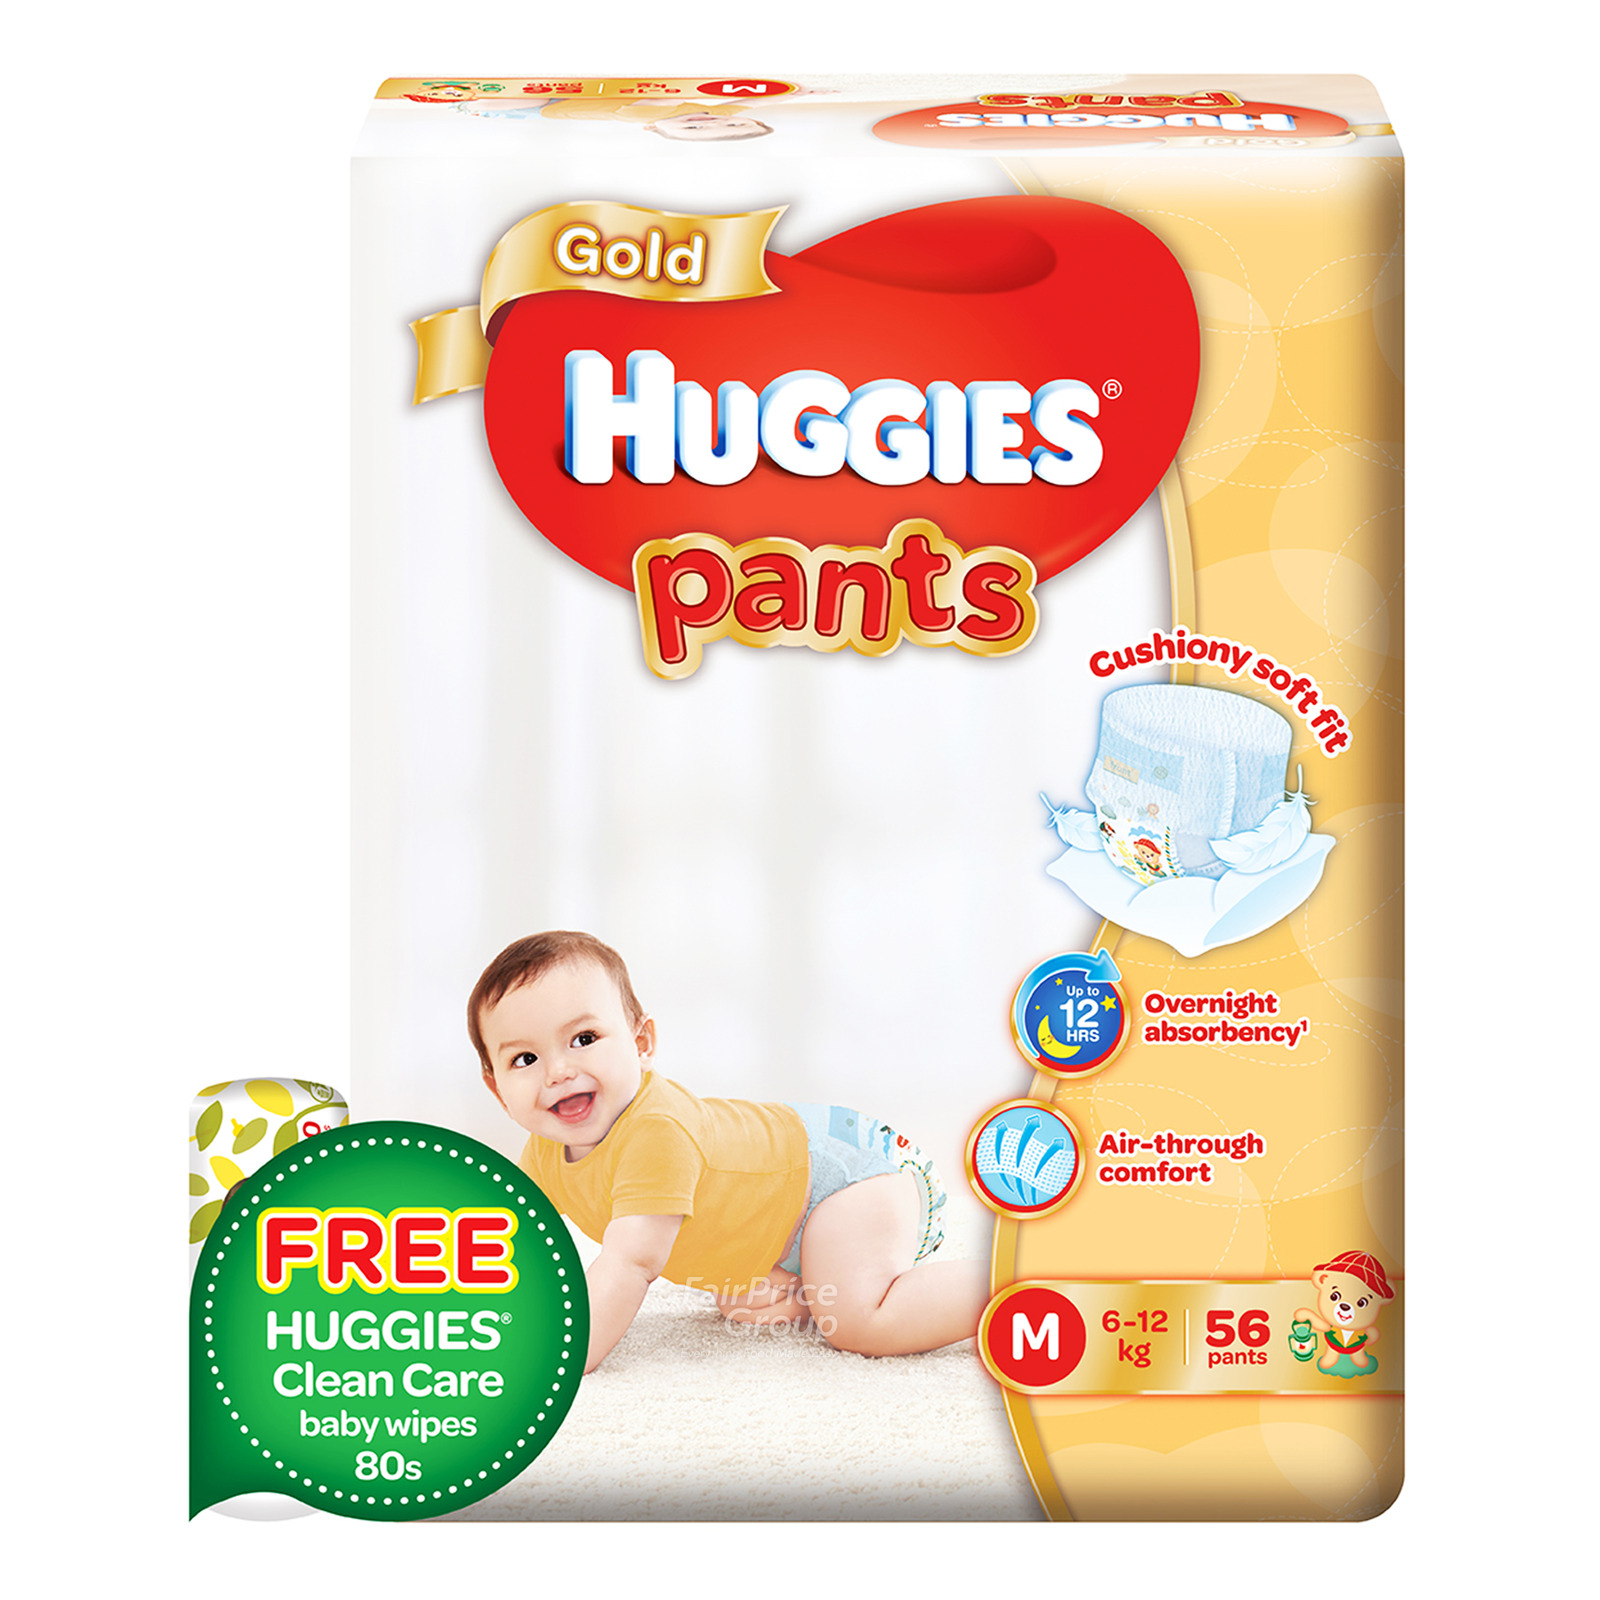 Huggies Gold Pants - M (6-12kg)